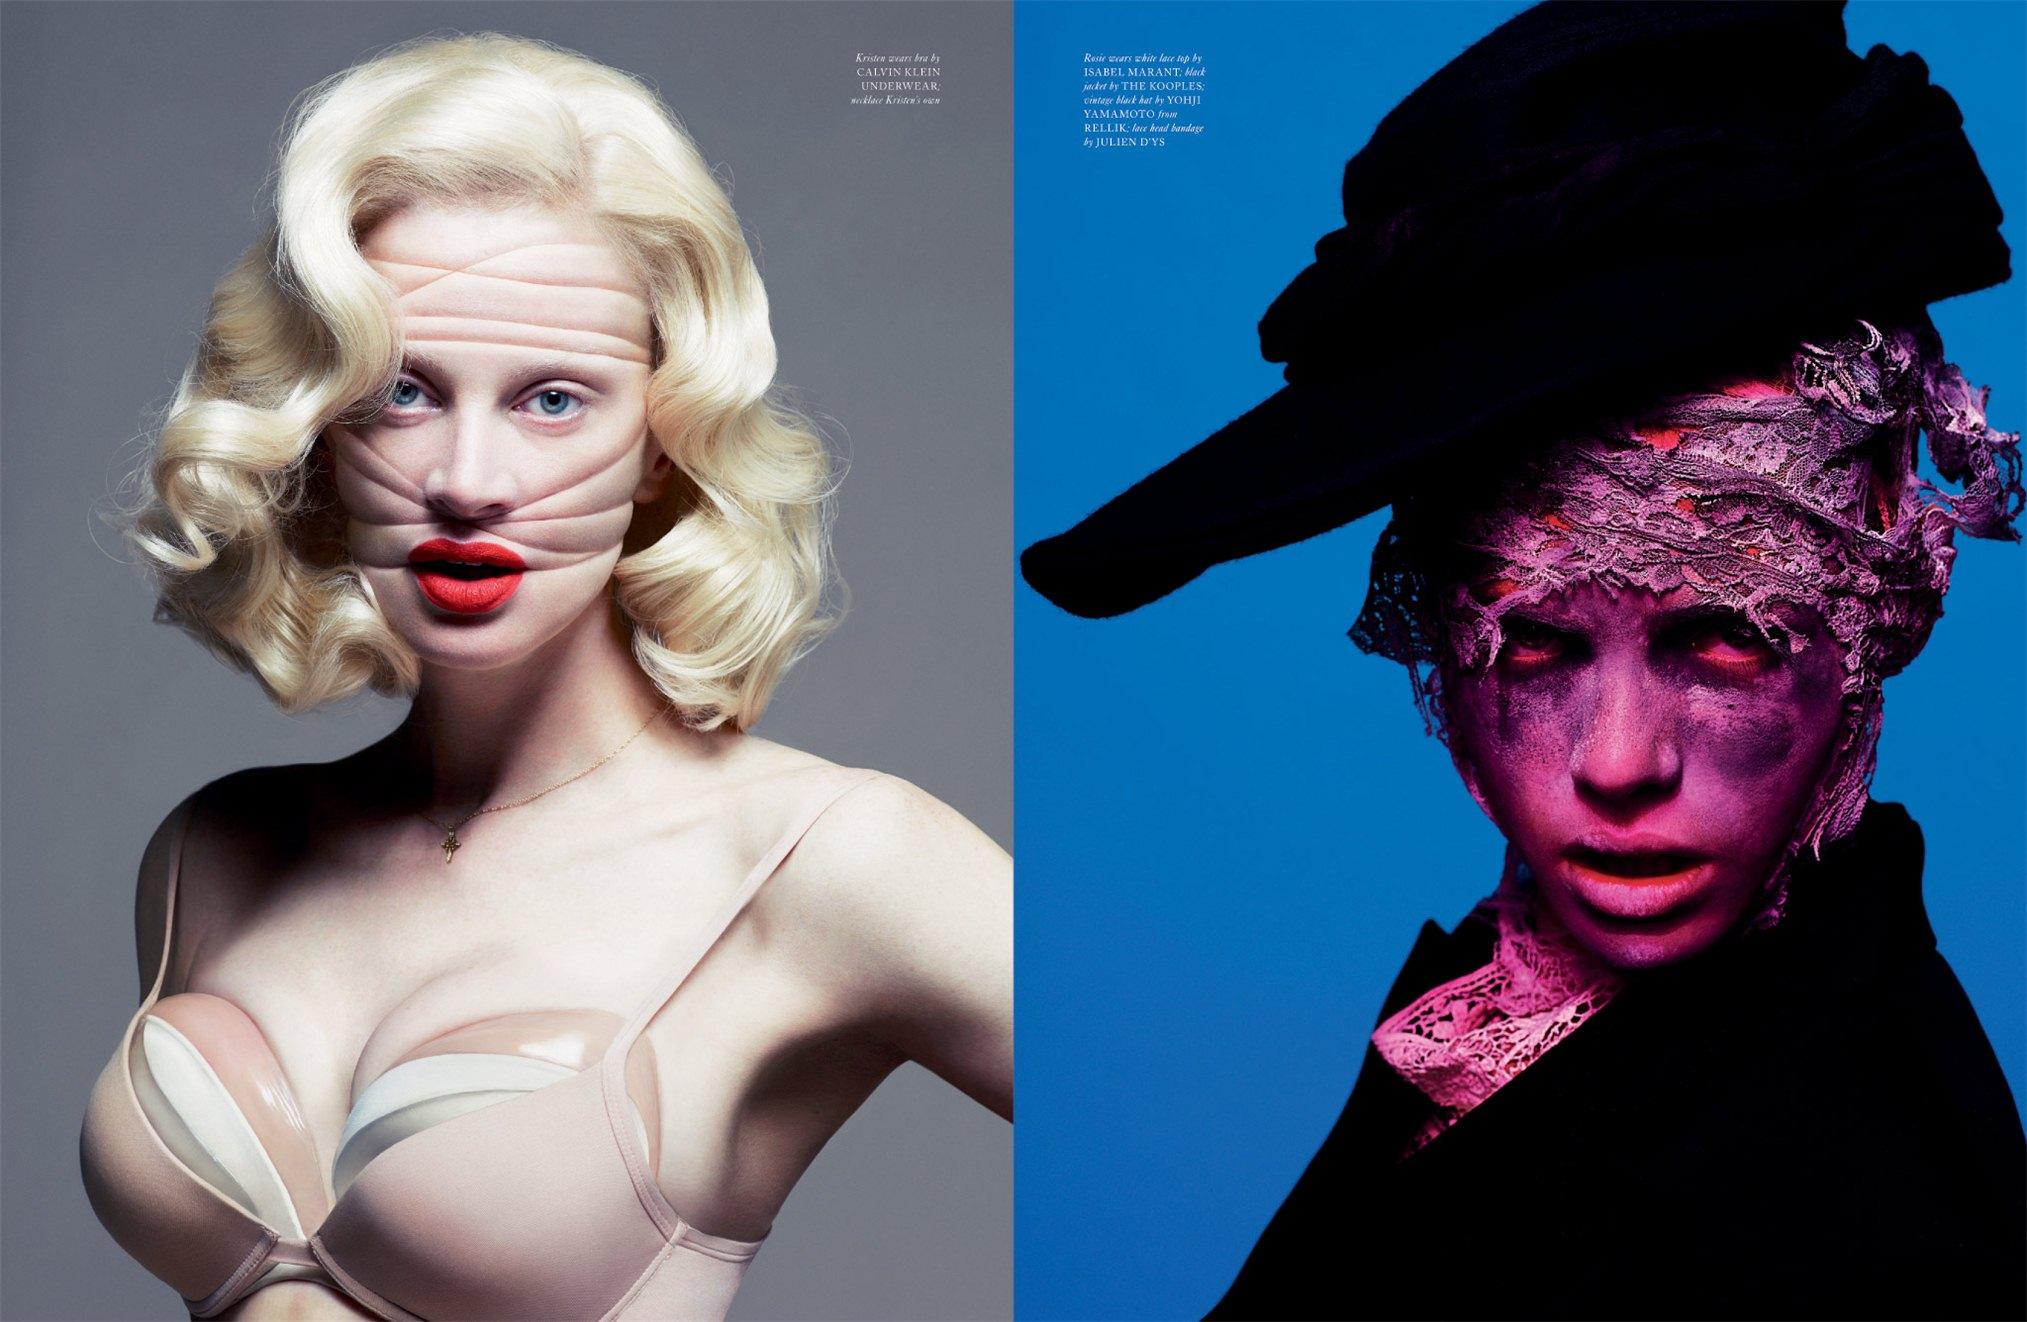 Кристен МакМенами / Kristen McMenamy / Рози Тапнер / Rosie Tapner - Fawnicate by Mert - Marcus in LOVE Magazine fall-winter 2012